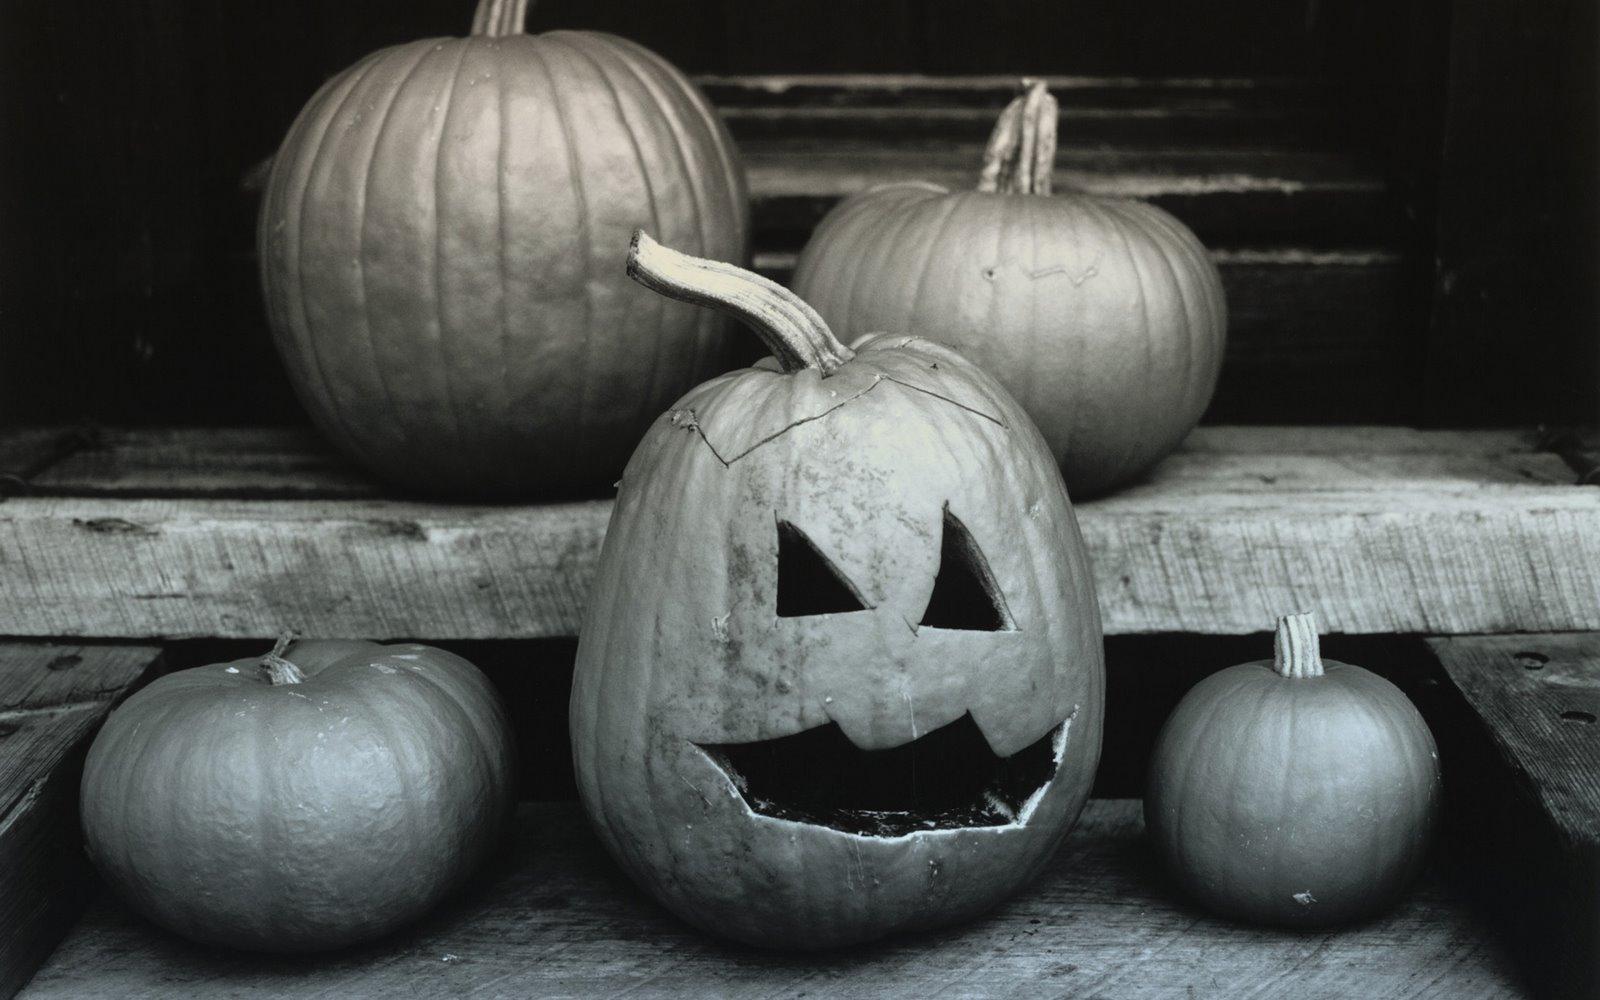 http://1.bp.blogspot.com/_W1ueYt1O3xs/TMv7fdgEjLI/AAAAAAAAW_0/PNoCI9zen9M/d/Halloween+Wallpapers+1920x1200-5.jpg